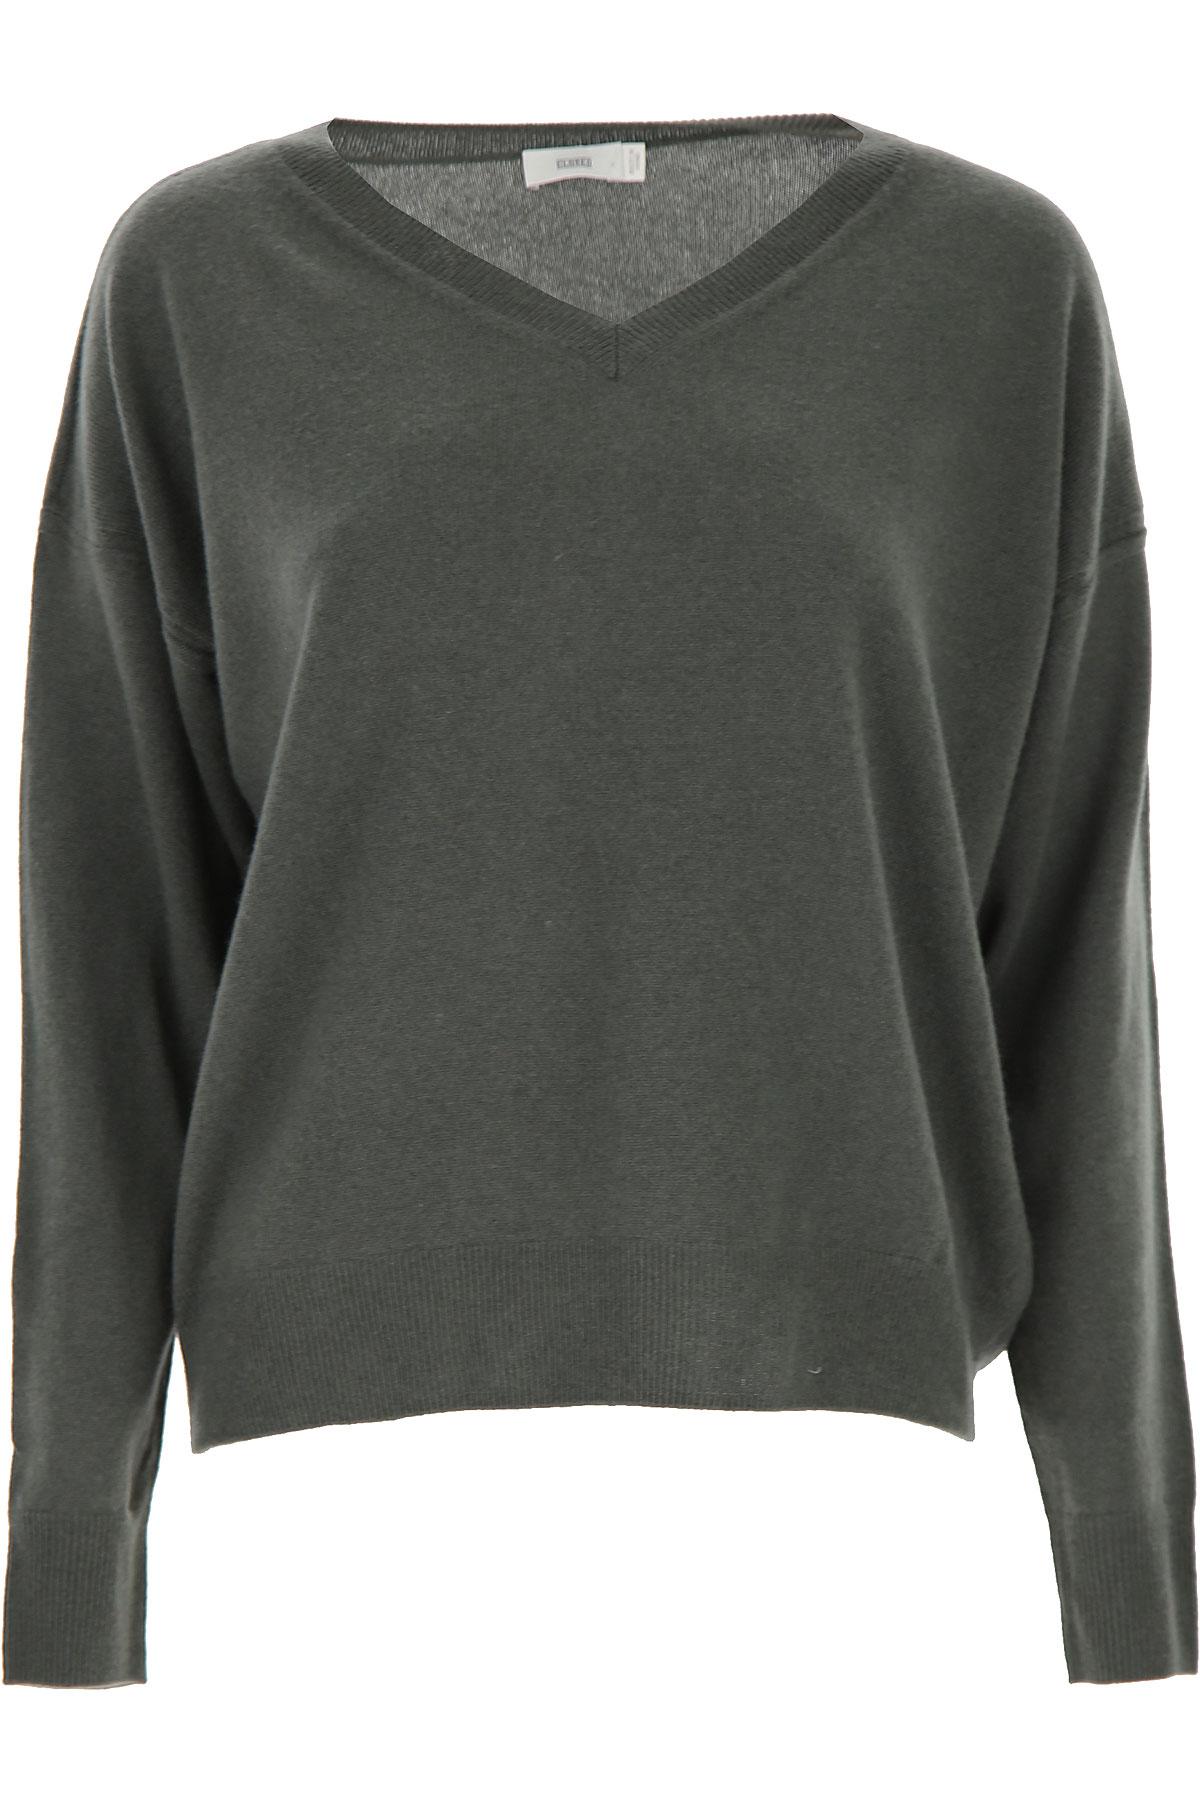 Closed Sweater for Women Jumper On Sale, Caper Green, Wool, 2019, 4 6